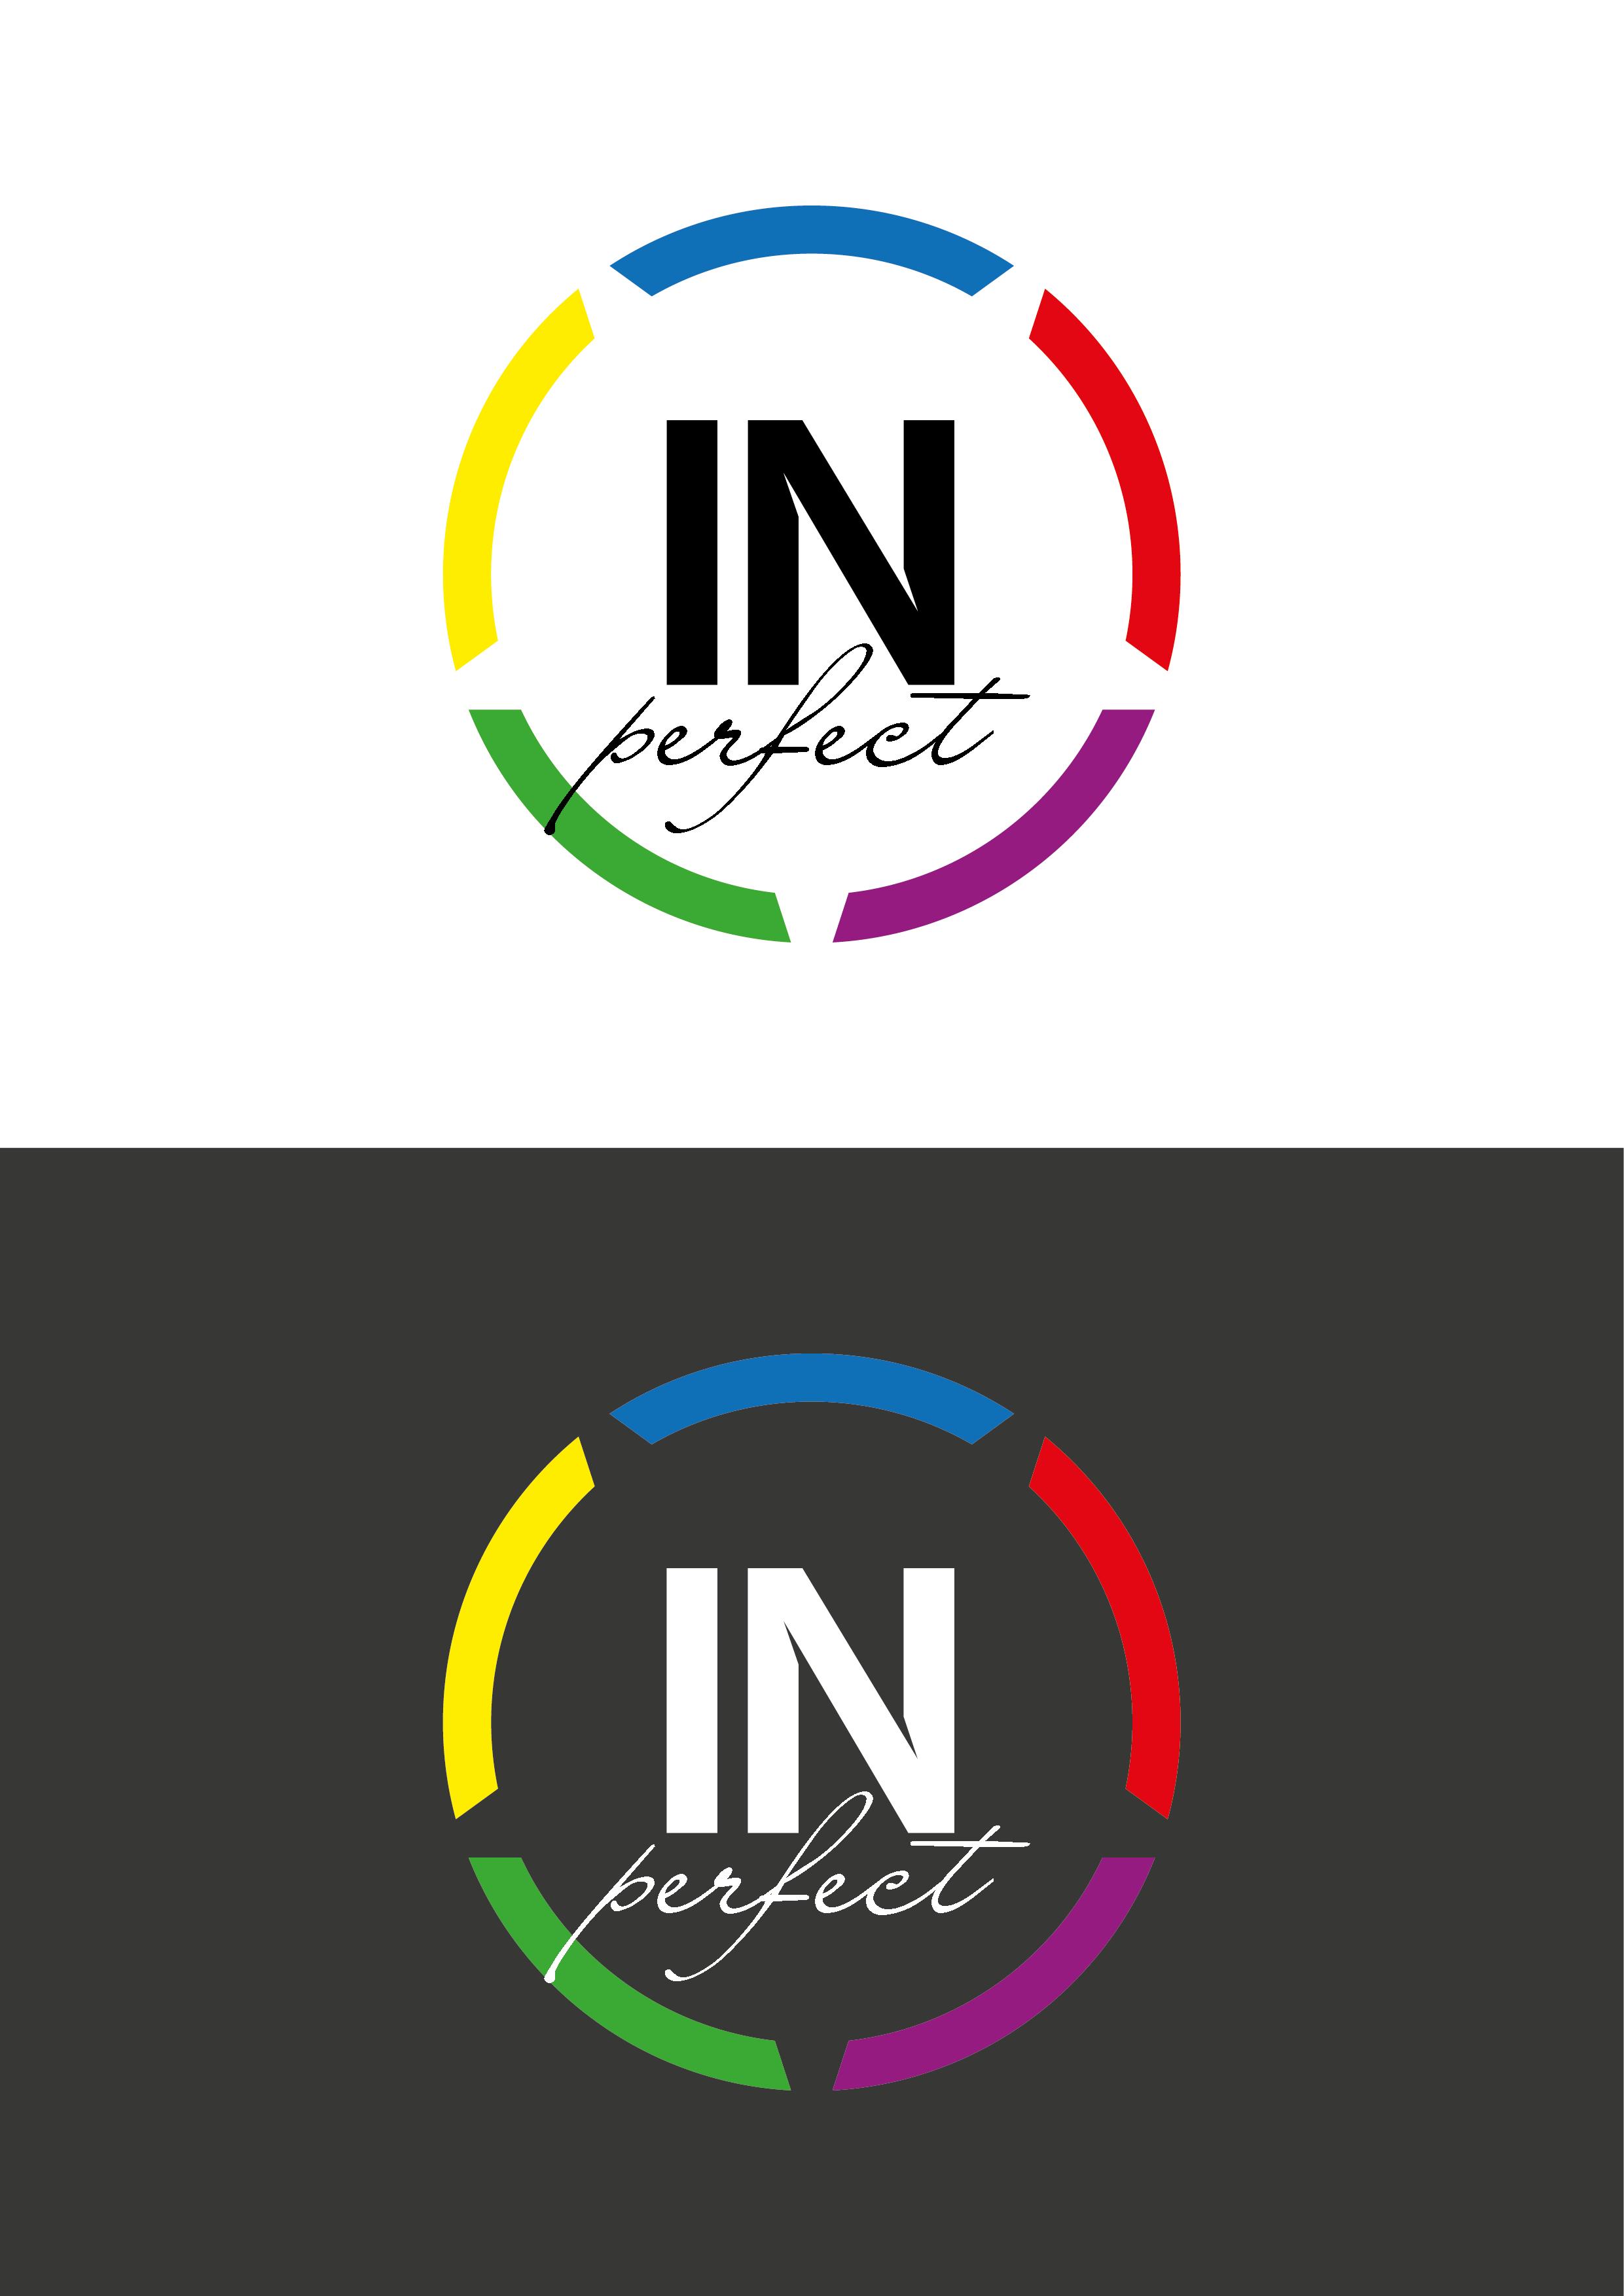 Необходимо доработать логотип In-perfect фото f_9445f232c5808996.png